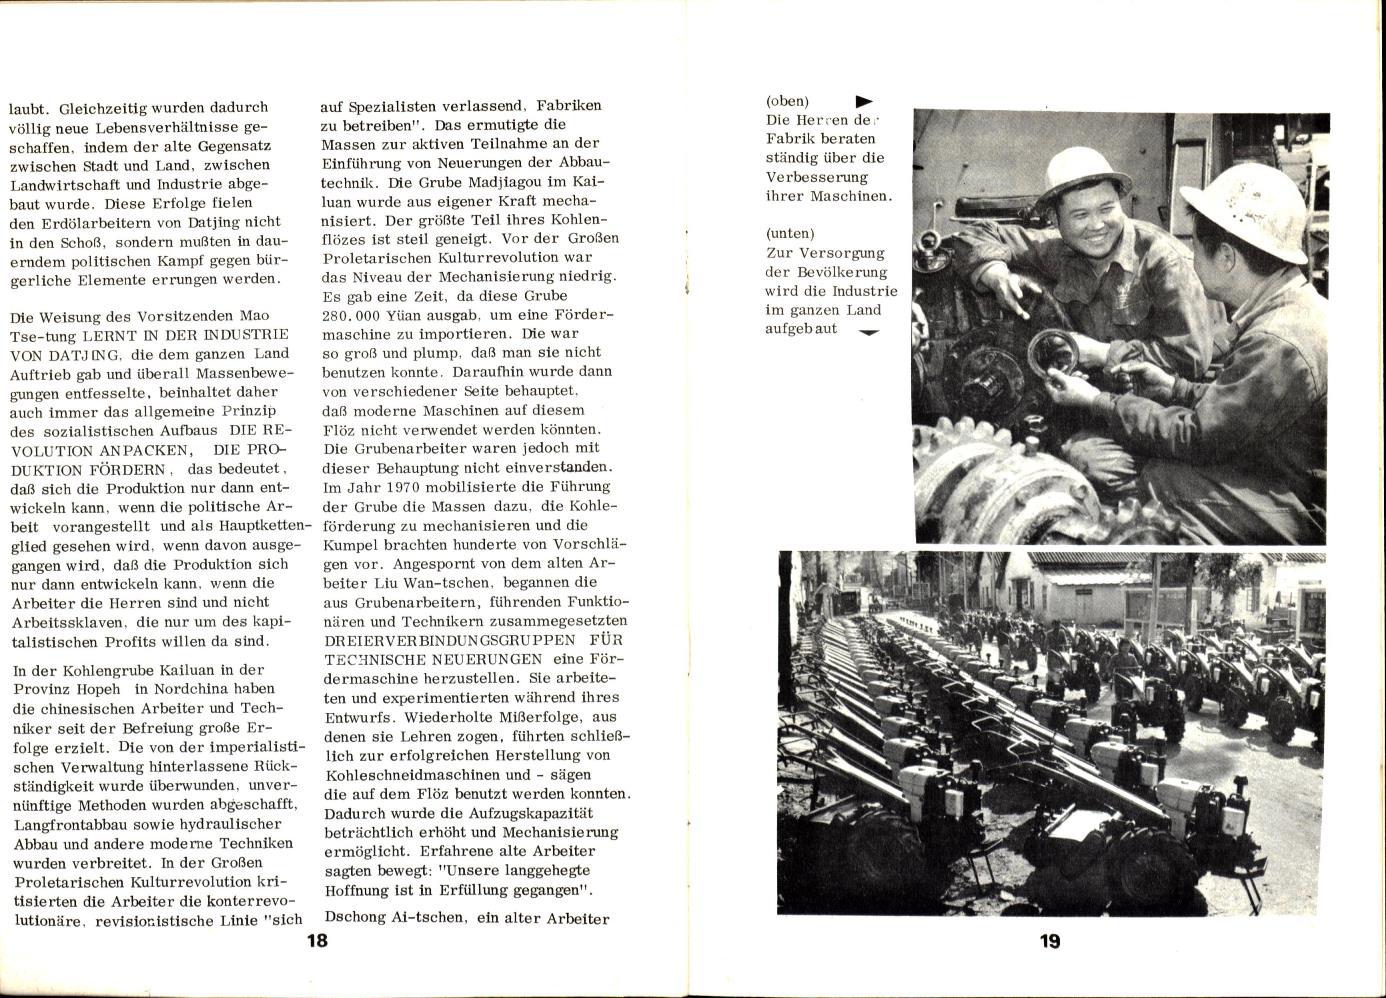 KPDAO_1975_Nationalausstellung_VRCh_in_Koeln_10